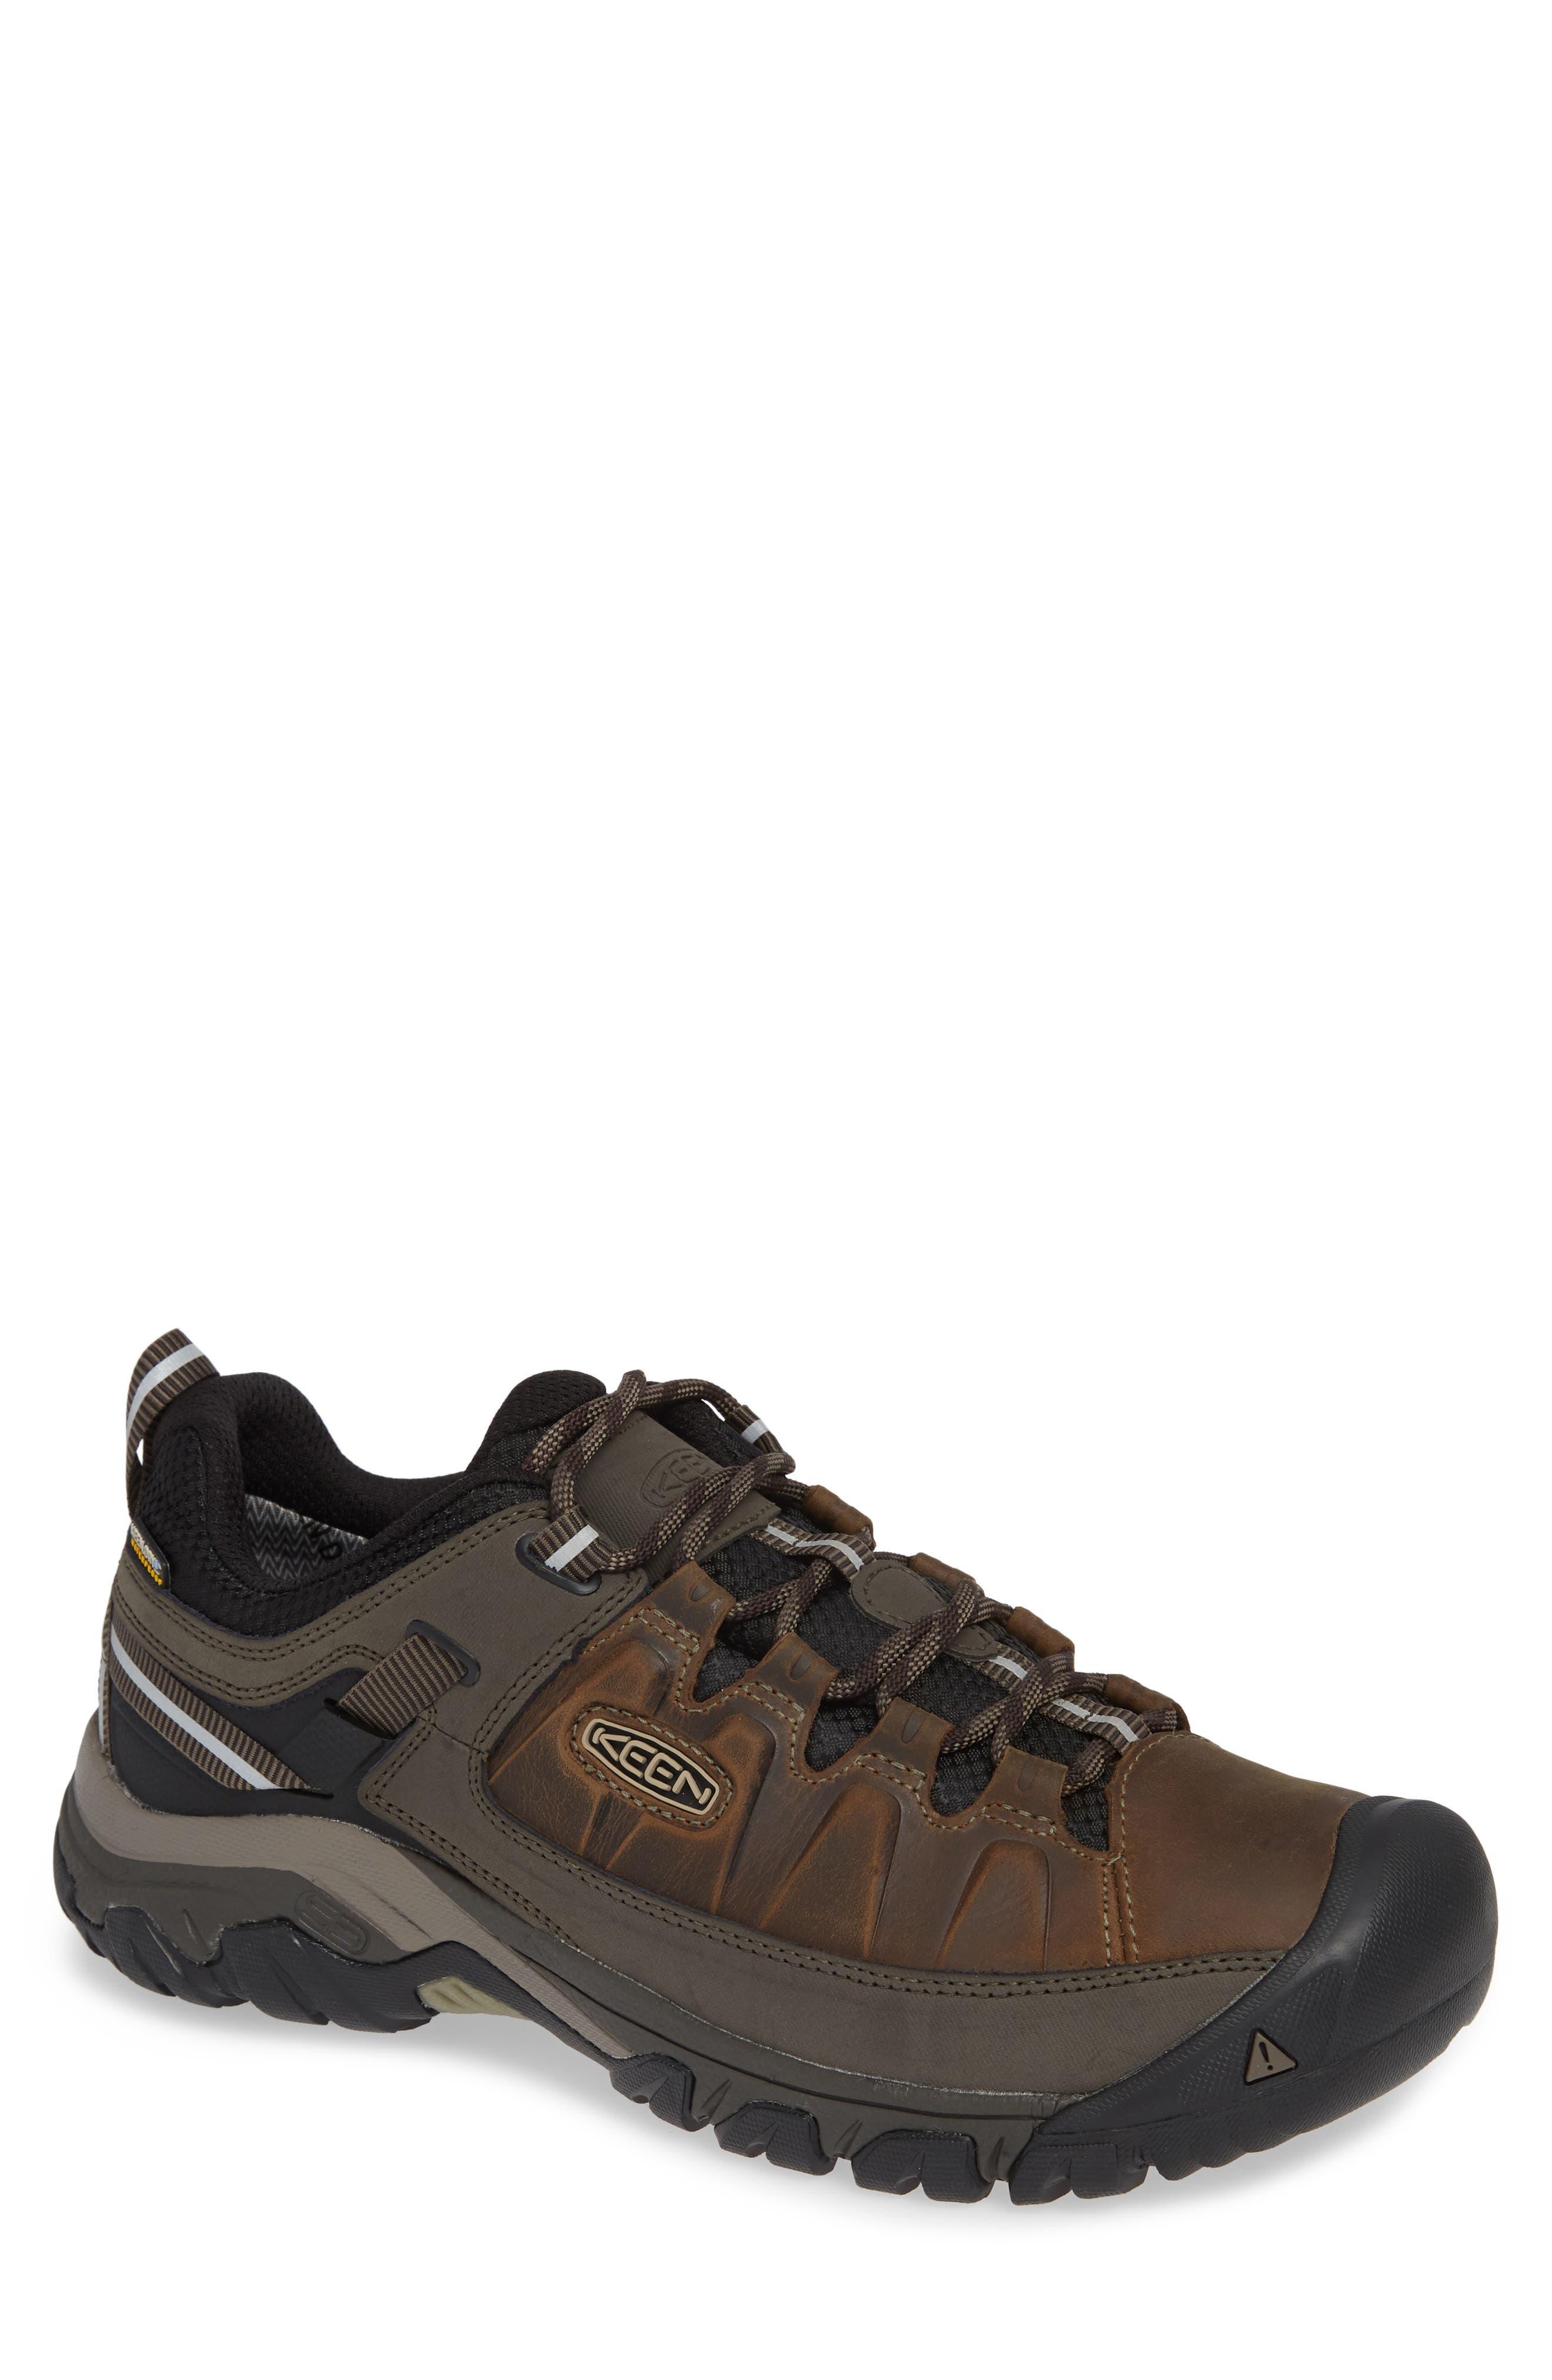 KEEN, Targhee III Waterproof Wide Hiking Shoe, Main thumbnail 1, color, BUNGEE CORD/ BLACK